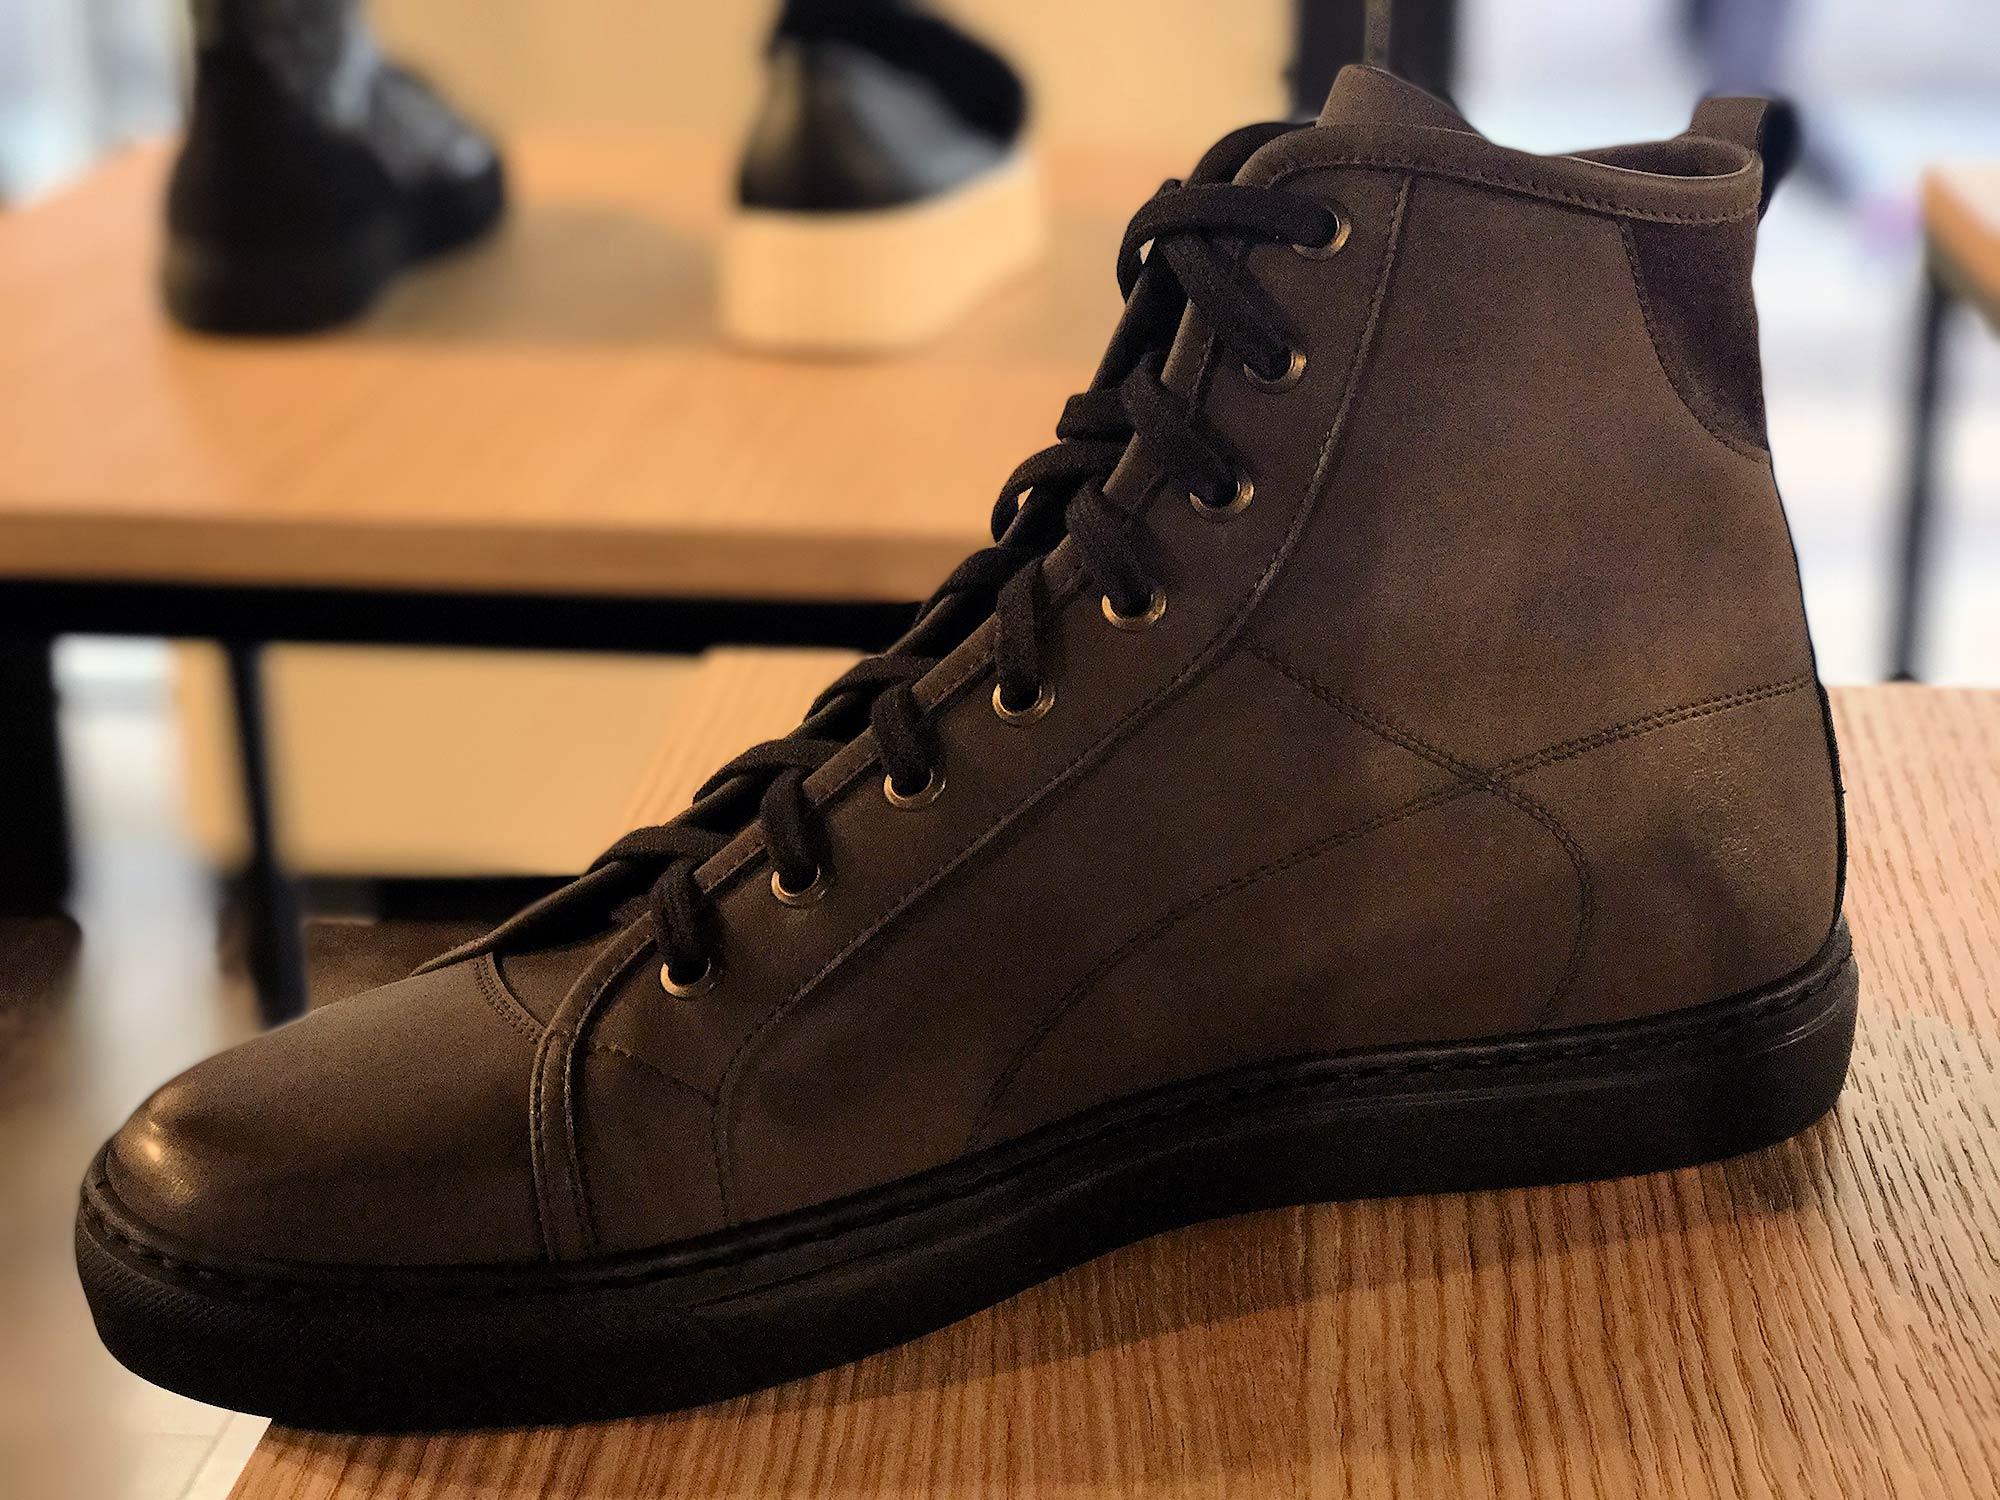 official photos 2e2e5 a342e Acquista scarpe per vegani - OFF30% sconti